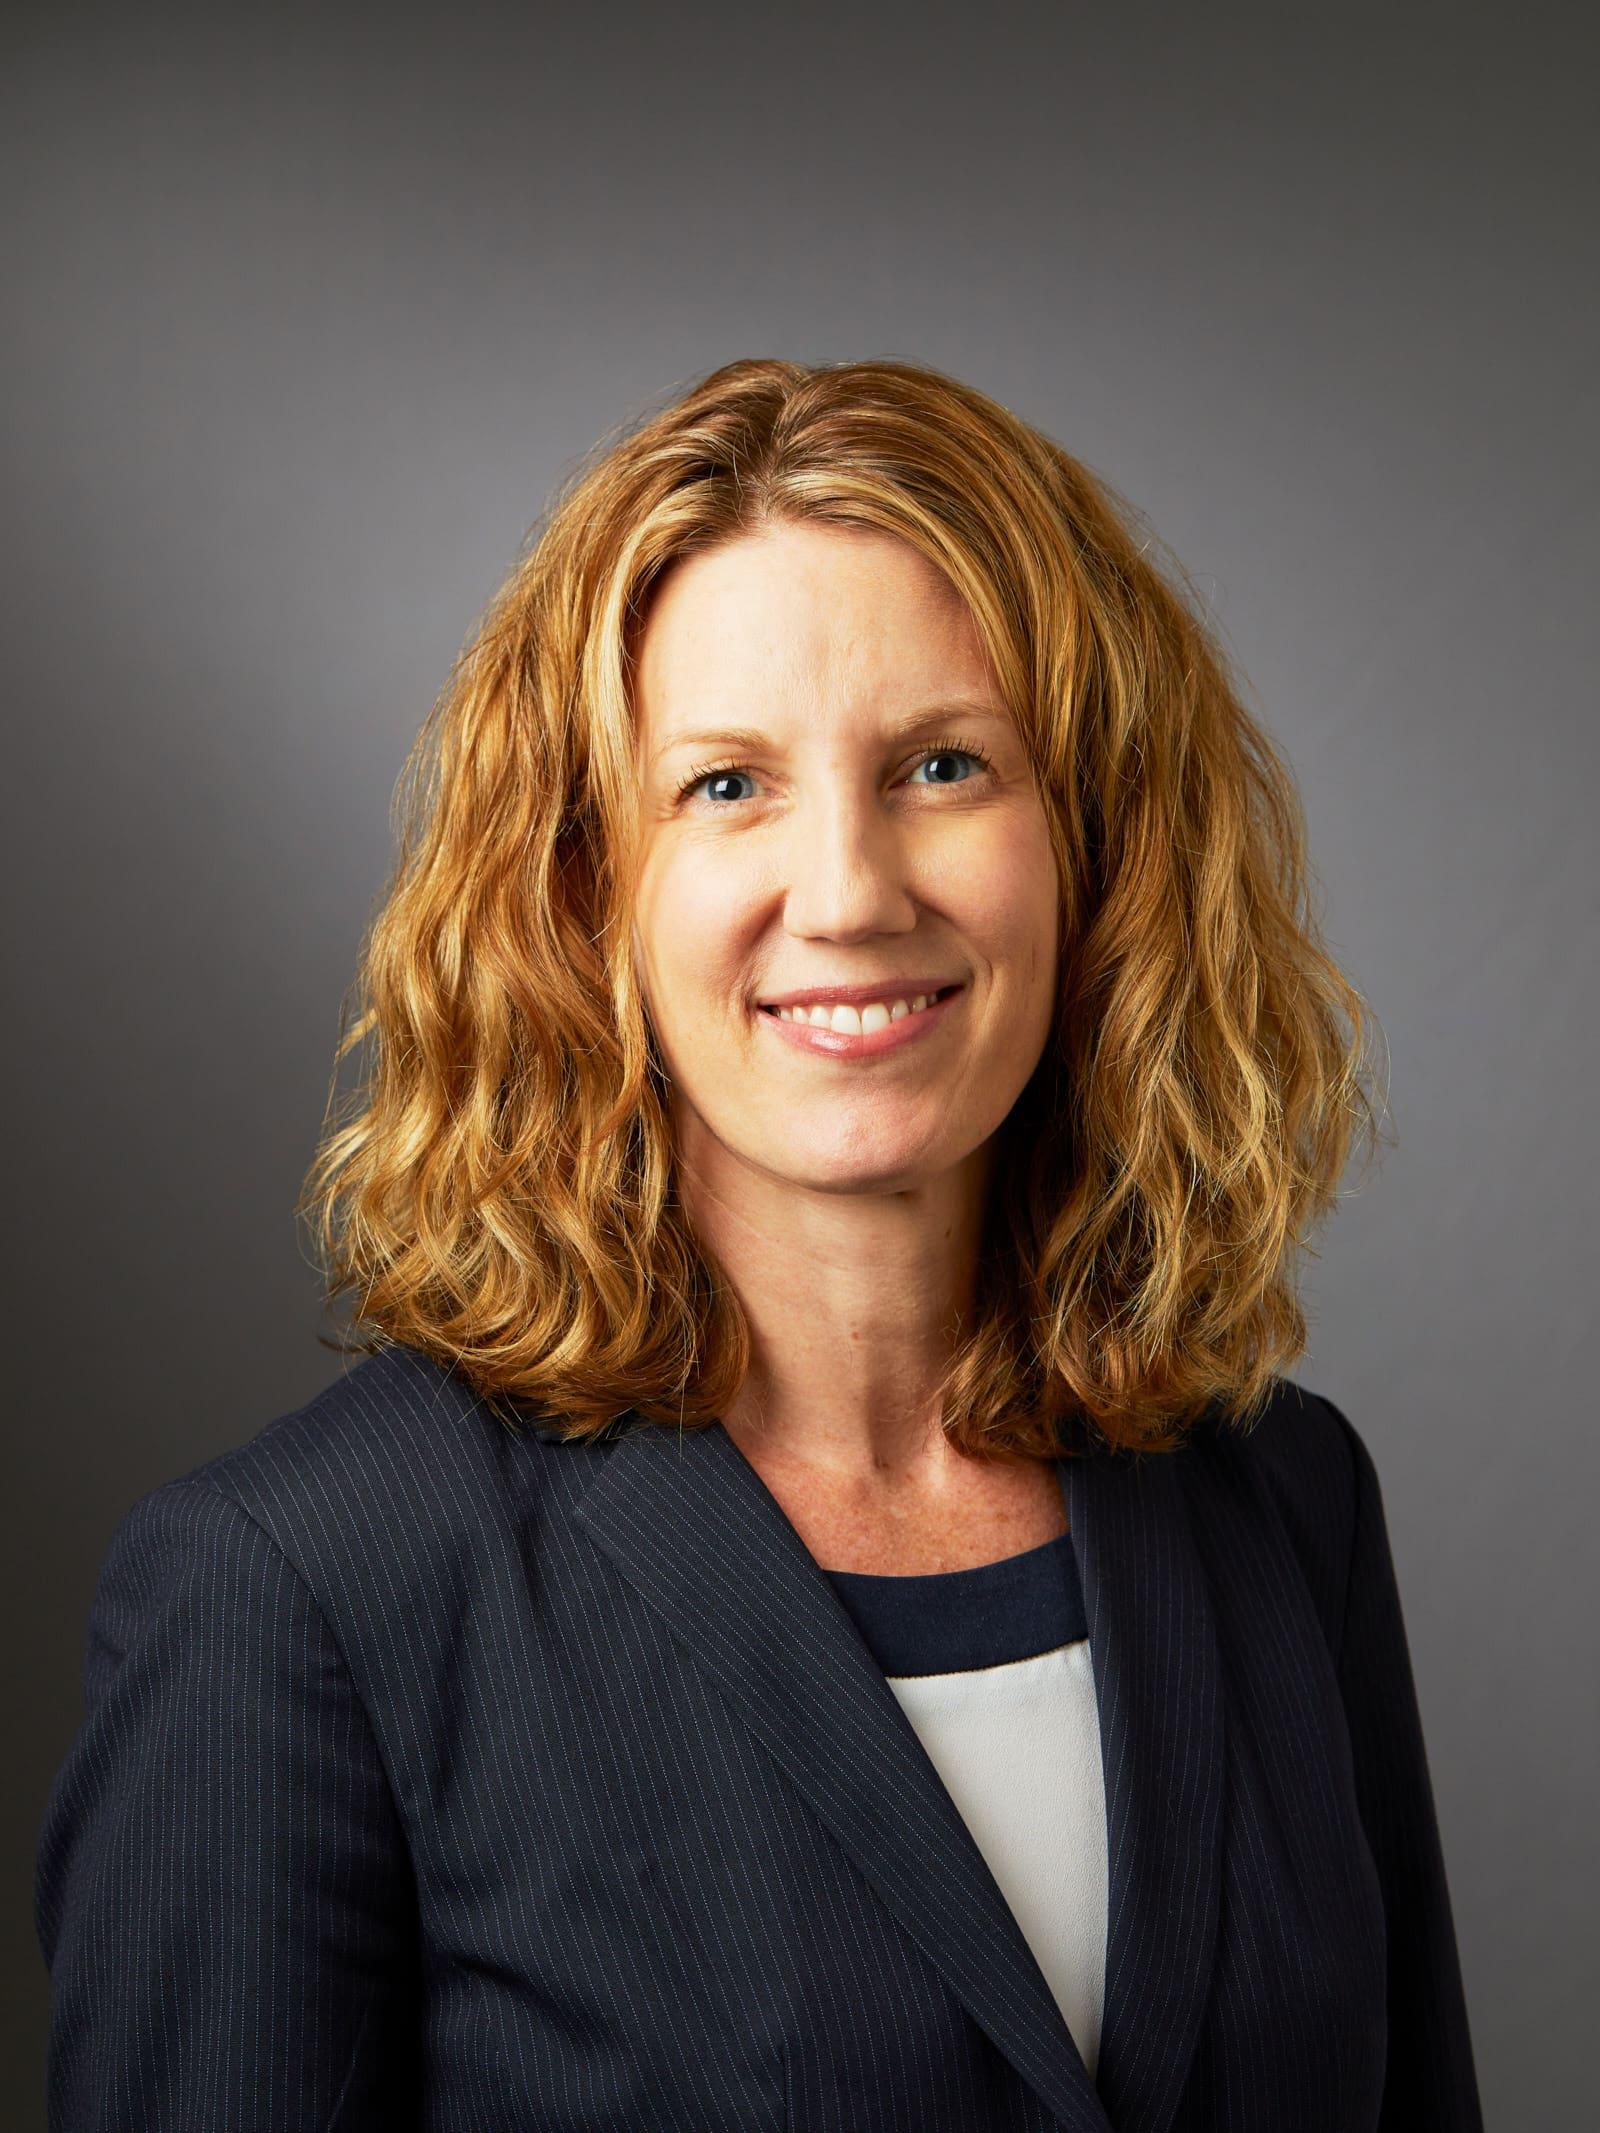 Carla Stover